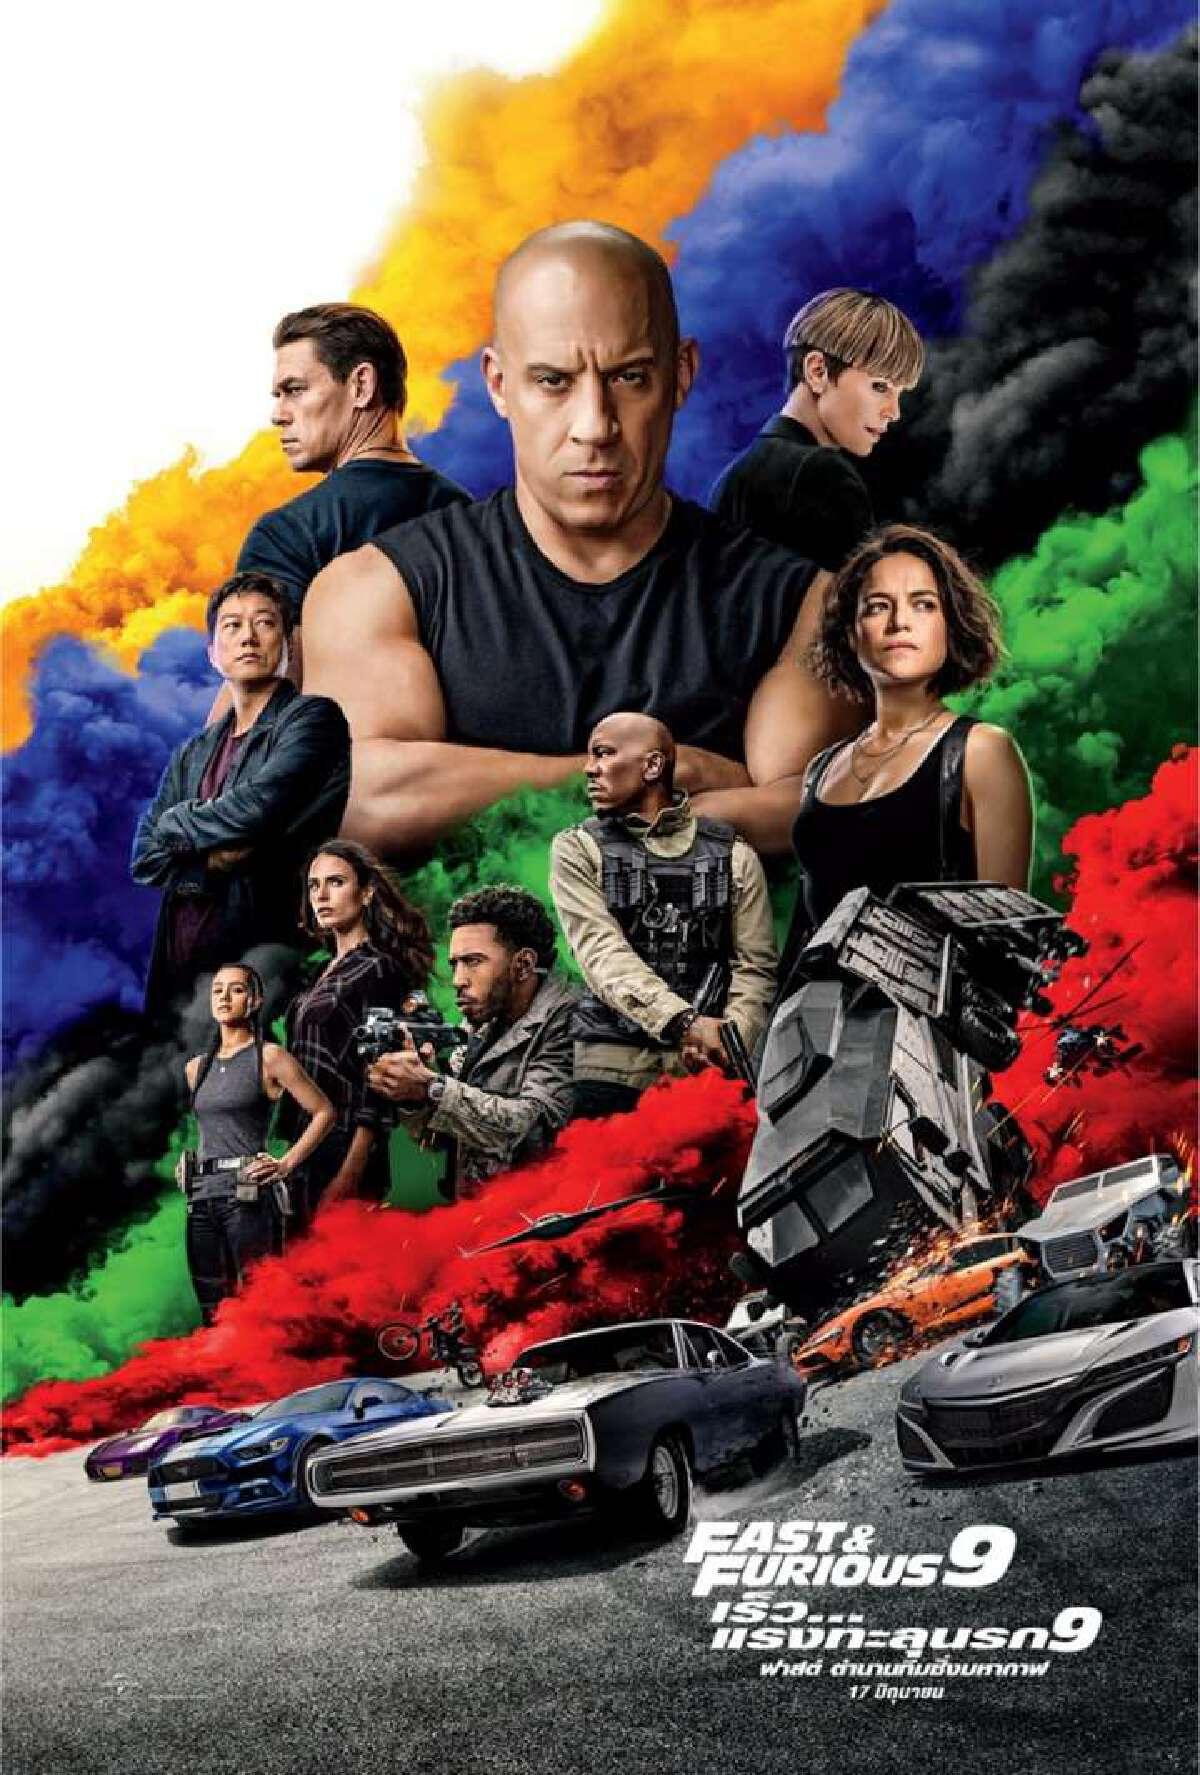 Fast & Furious 9 หนังฟาส9 ภาพยนตร์รถซิ่งดังเข้าไทย 30 มิ.ย. 64